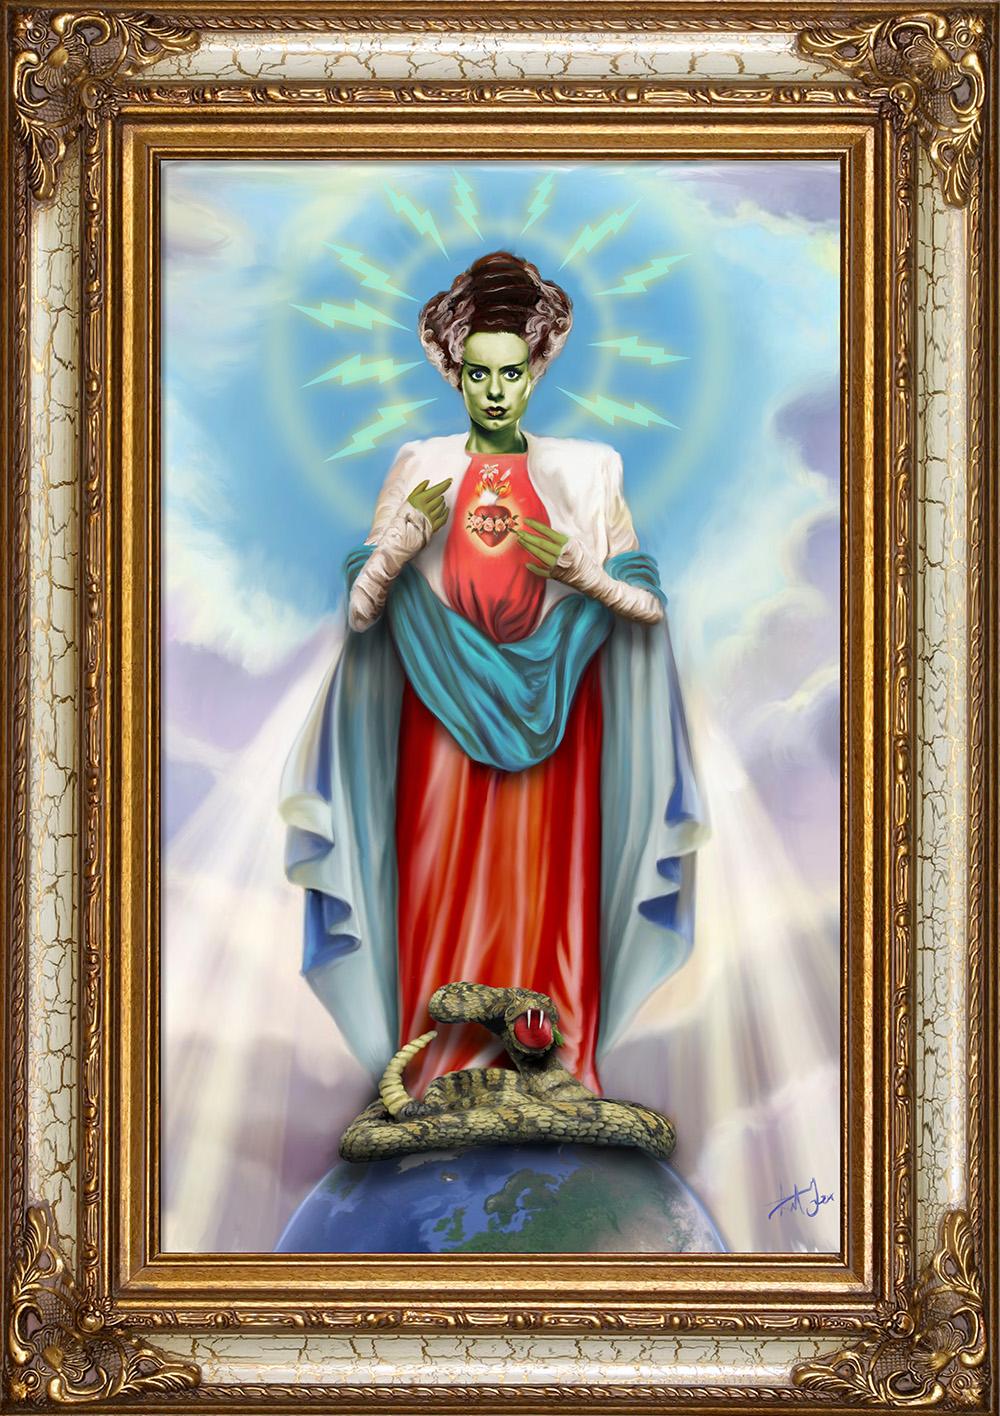 Bride of Frankenchrist small for web.jpg